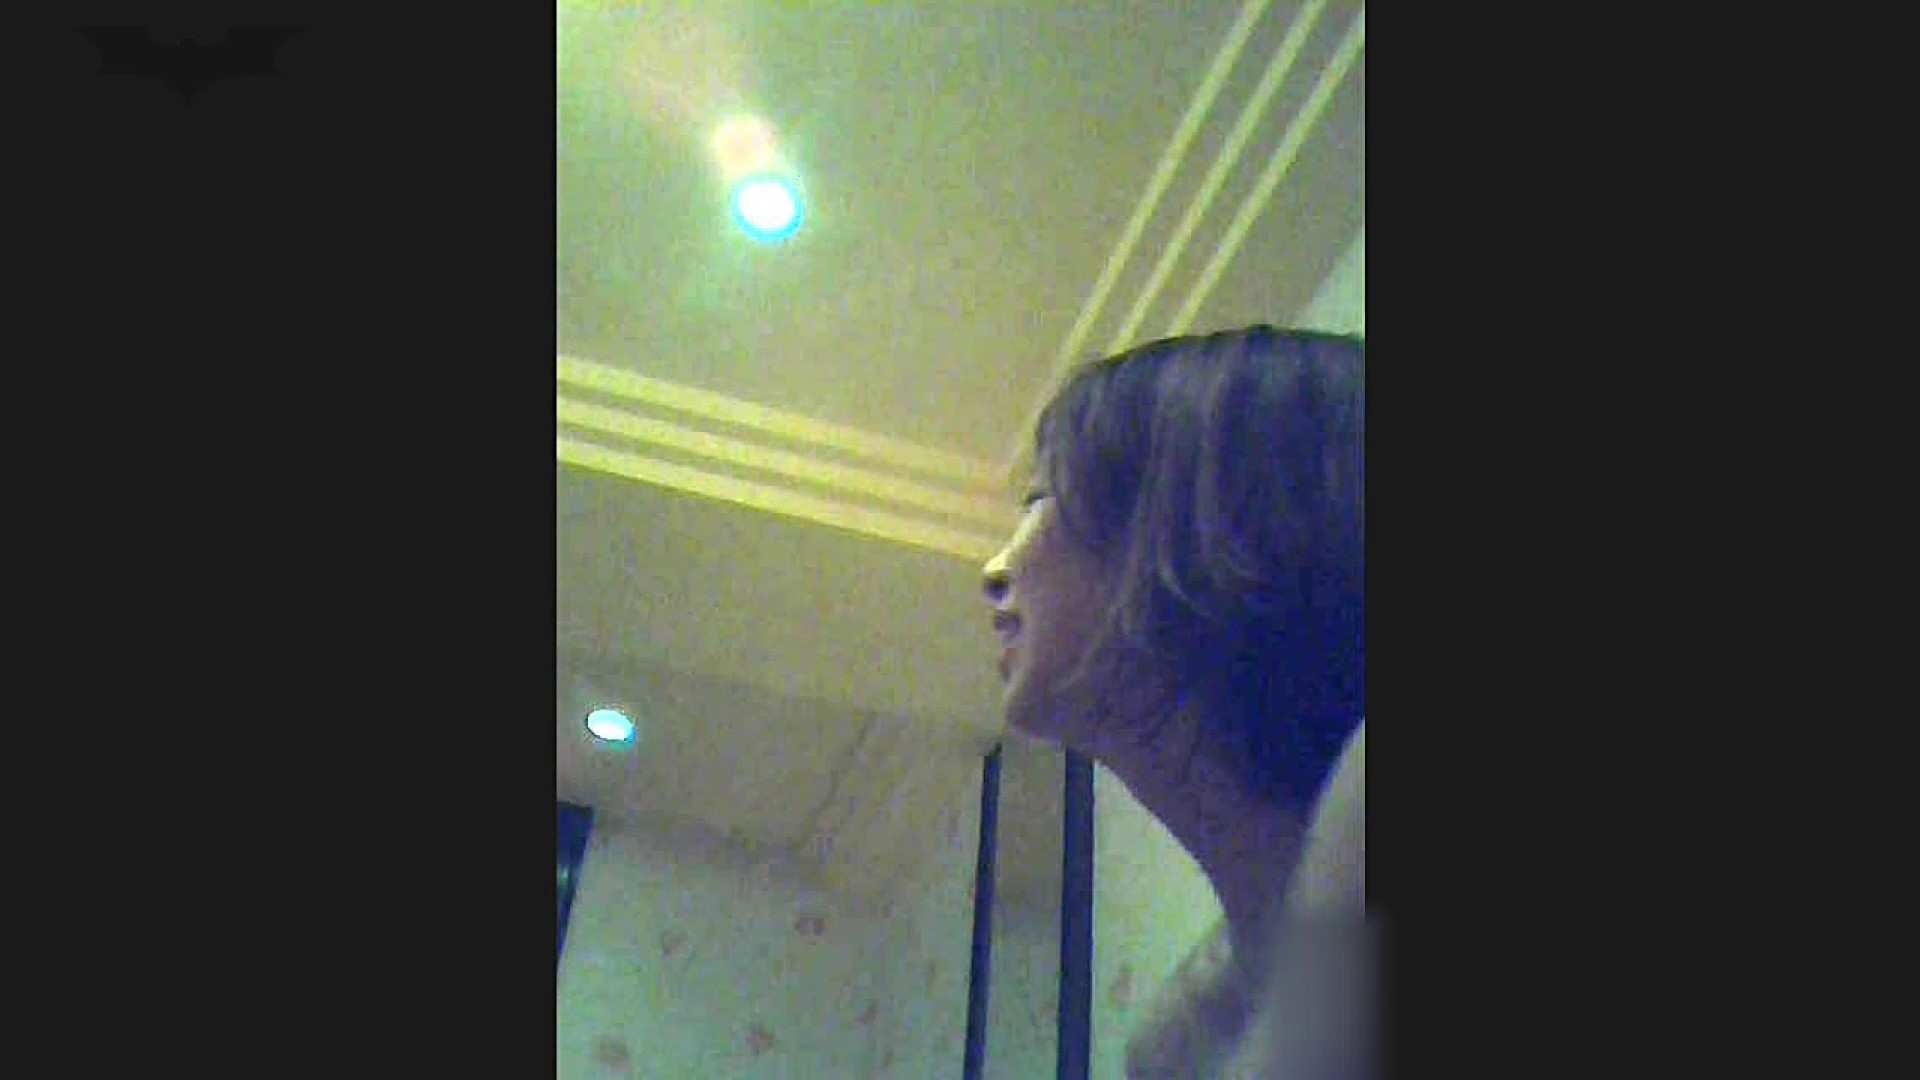 ▲2017_05位▲ 学園アイドル美人女子大生!❶4人厳選詰合せVol.49 人気作   女子大生  113画像 6